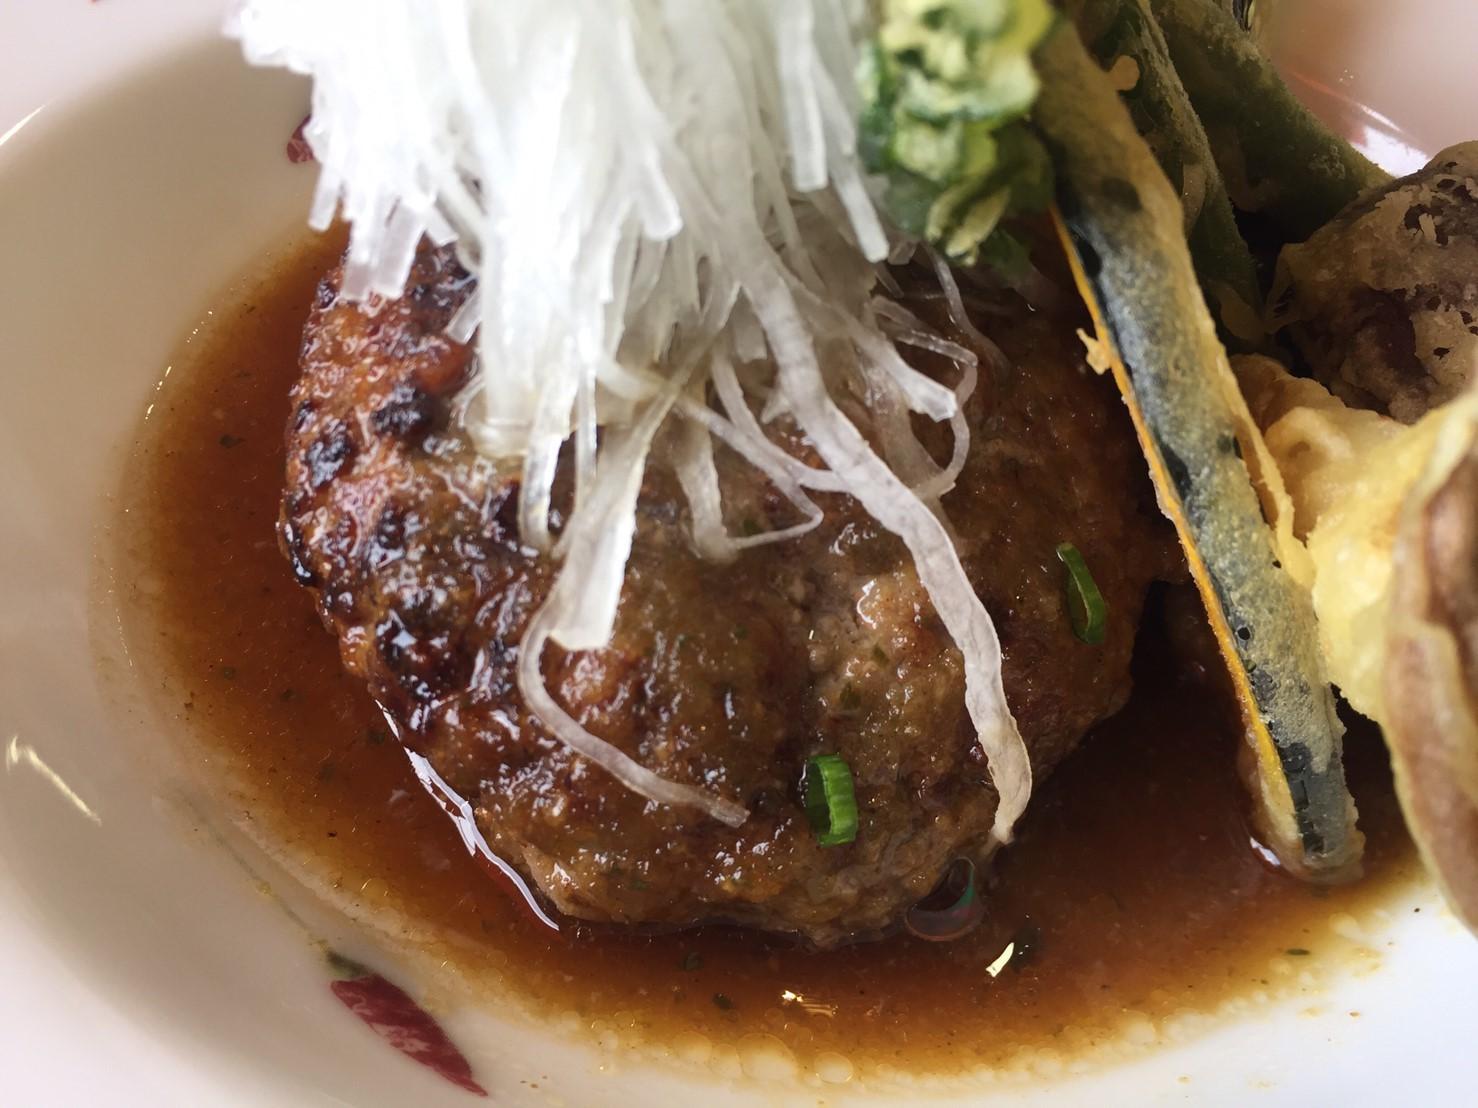 cafe & restaurant アンドリュース 日替わりランチ  ラス1和風ハンバーグ_e0115904_19422977.jpg